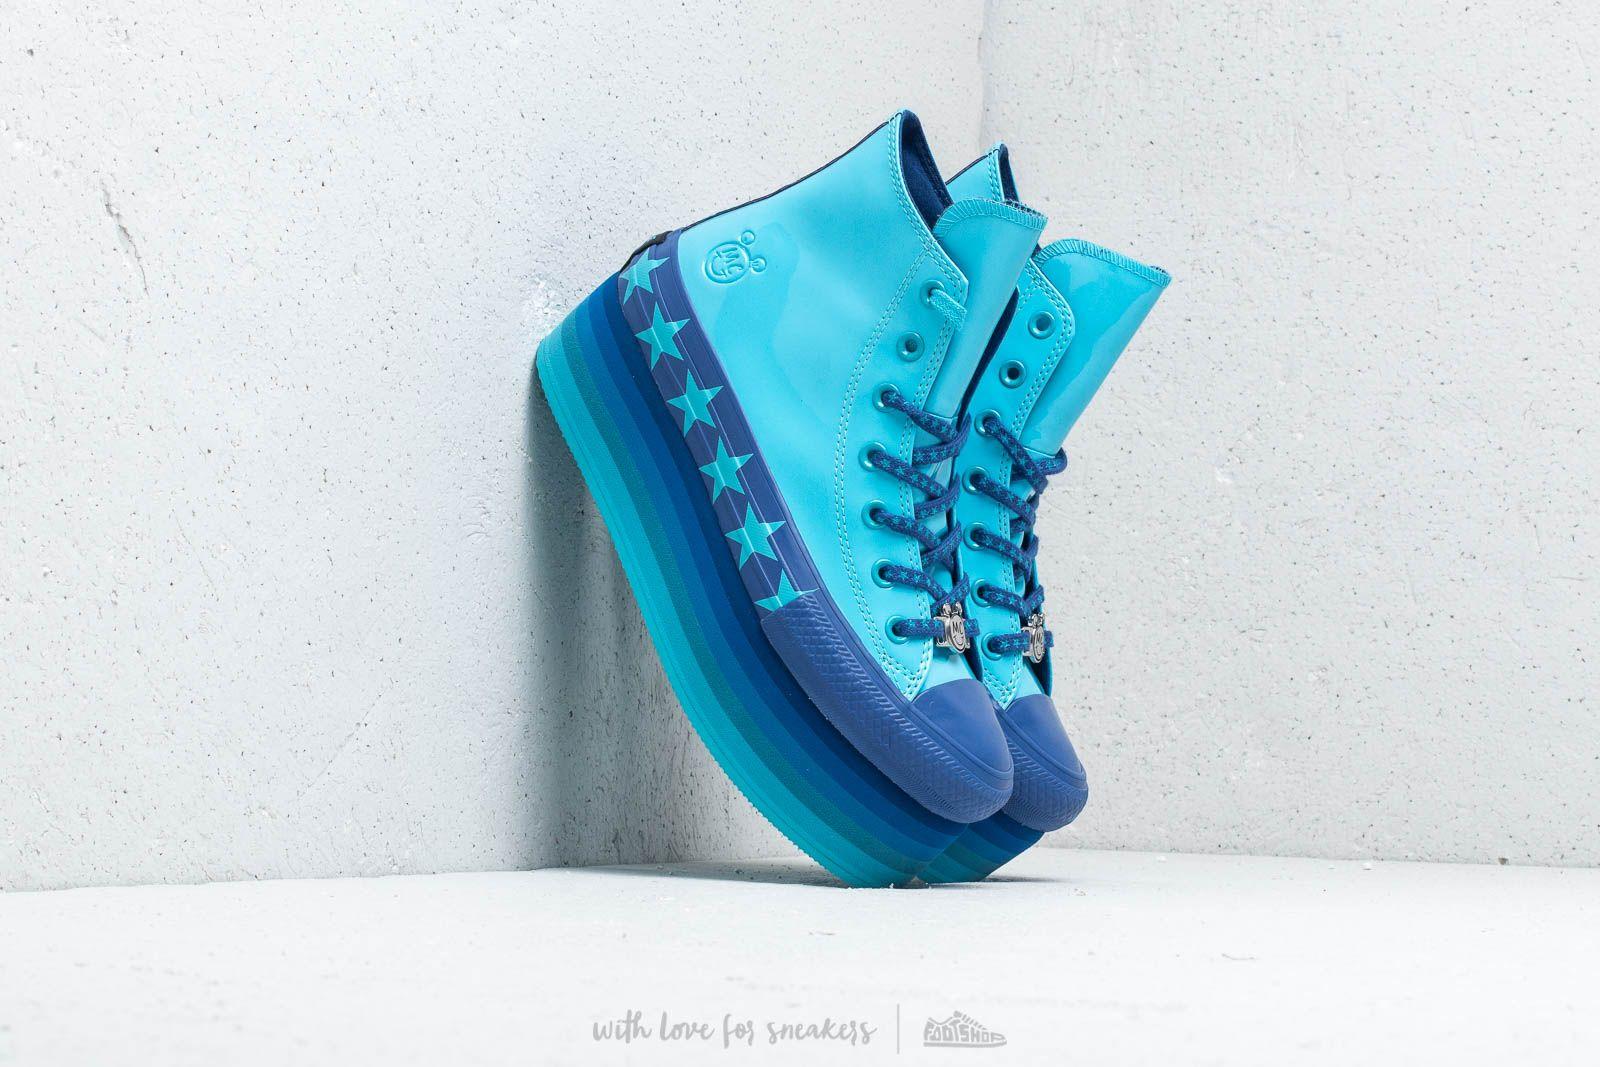 Converse x Miley Cyrus Chuck Taylor All Star Platform Hi Gnarly Blue/ Blue/ Gnarly Blue za skvelú cenu 95 € kúpite na Footshop.sk